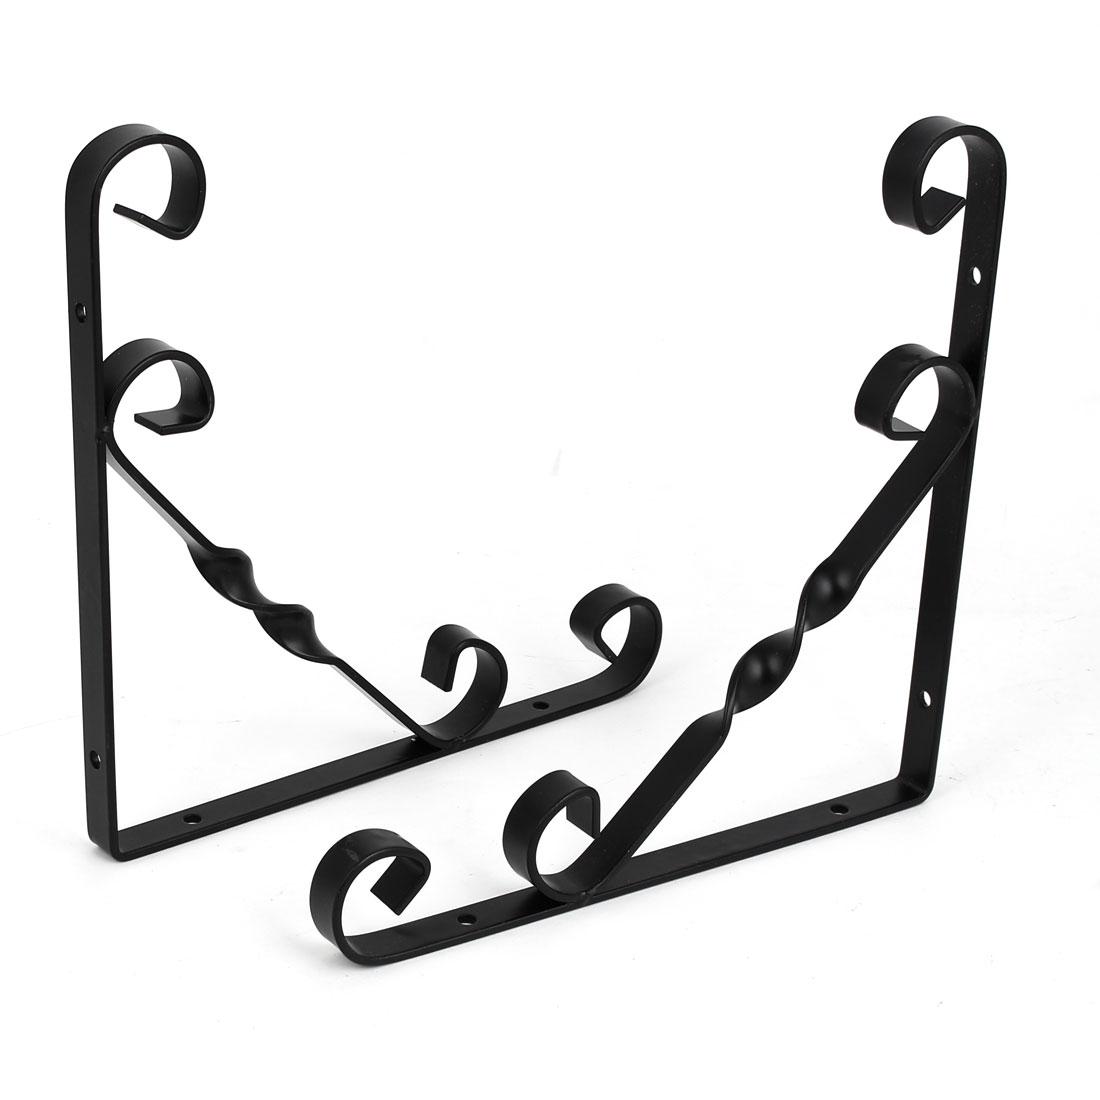 Home Shop Wall Mounted Metal L Shaped Shelf Bracket Support Holder Black 200x200mm 2pcs